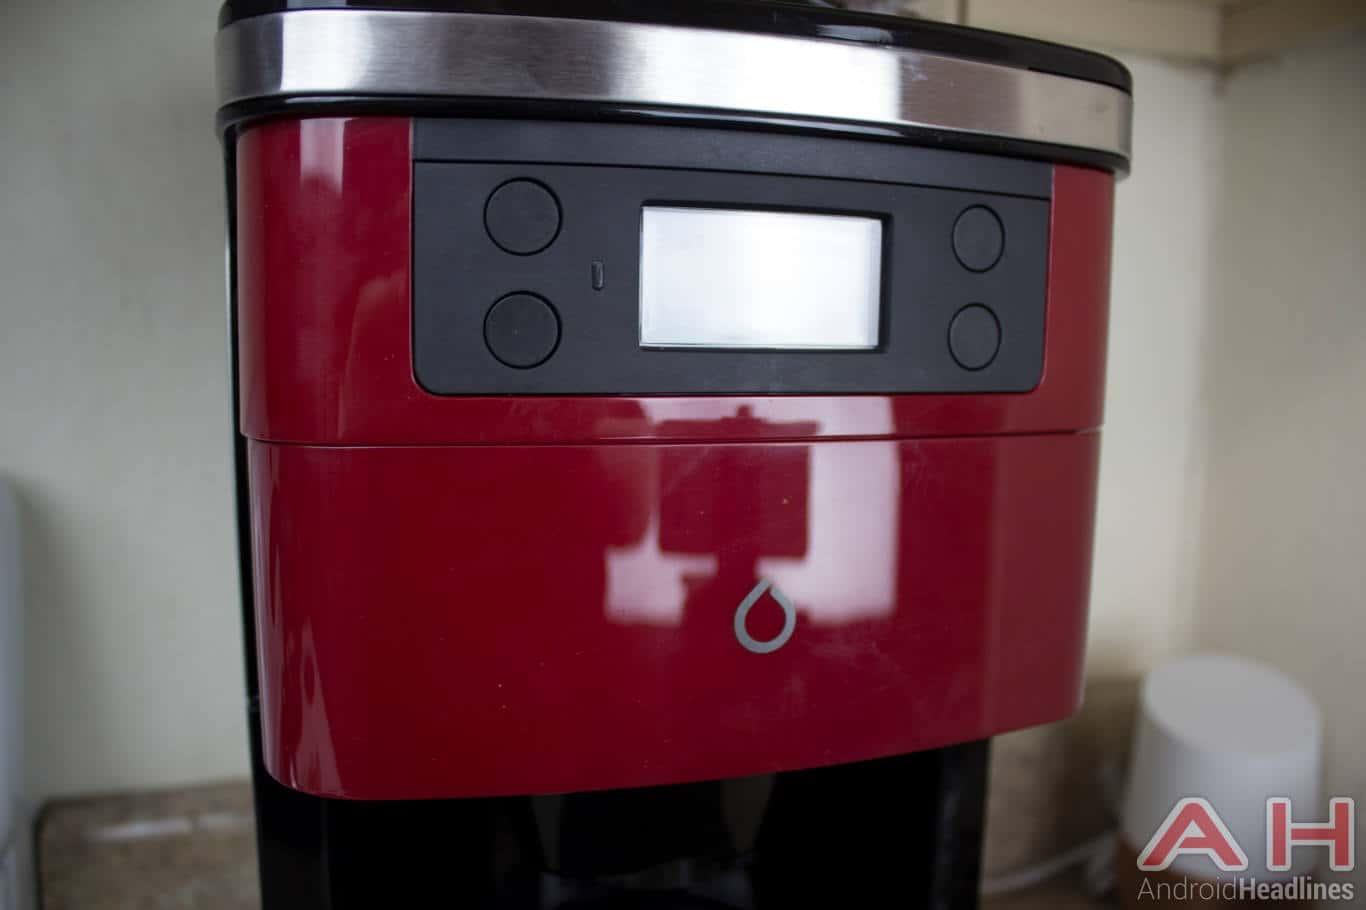 Smarter Coffee AH NS 14